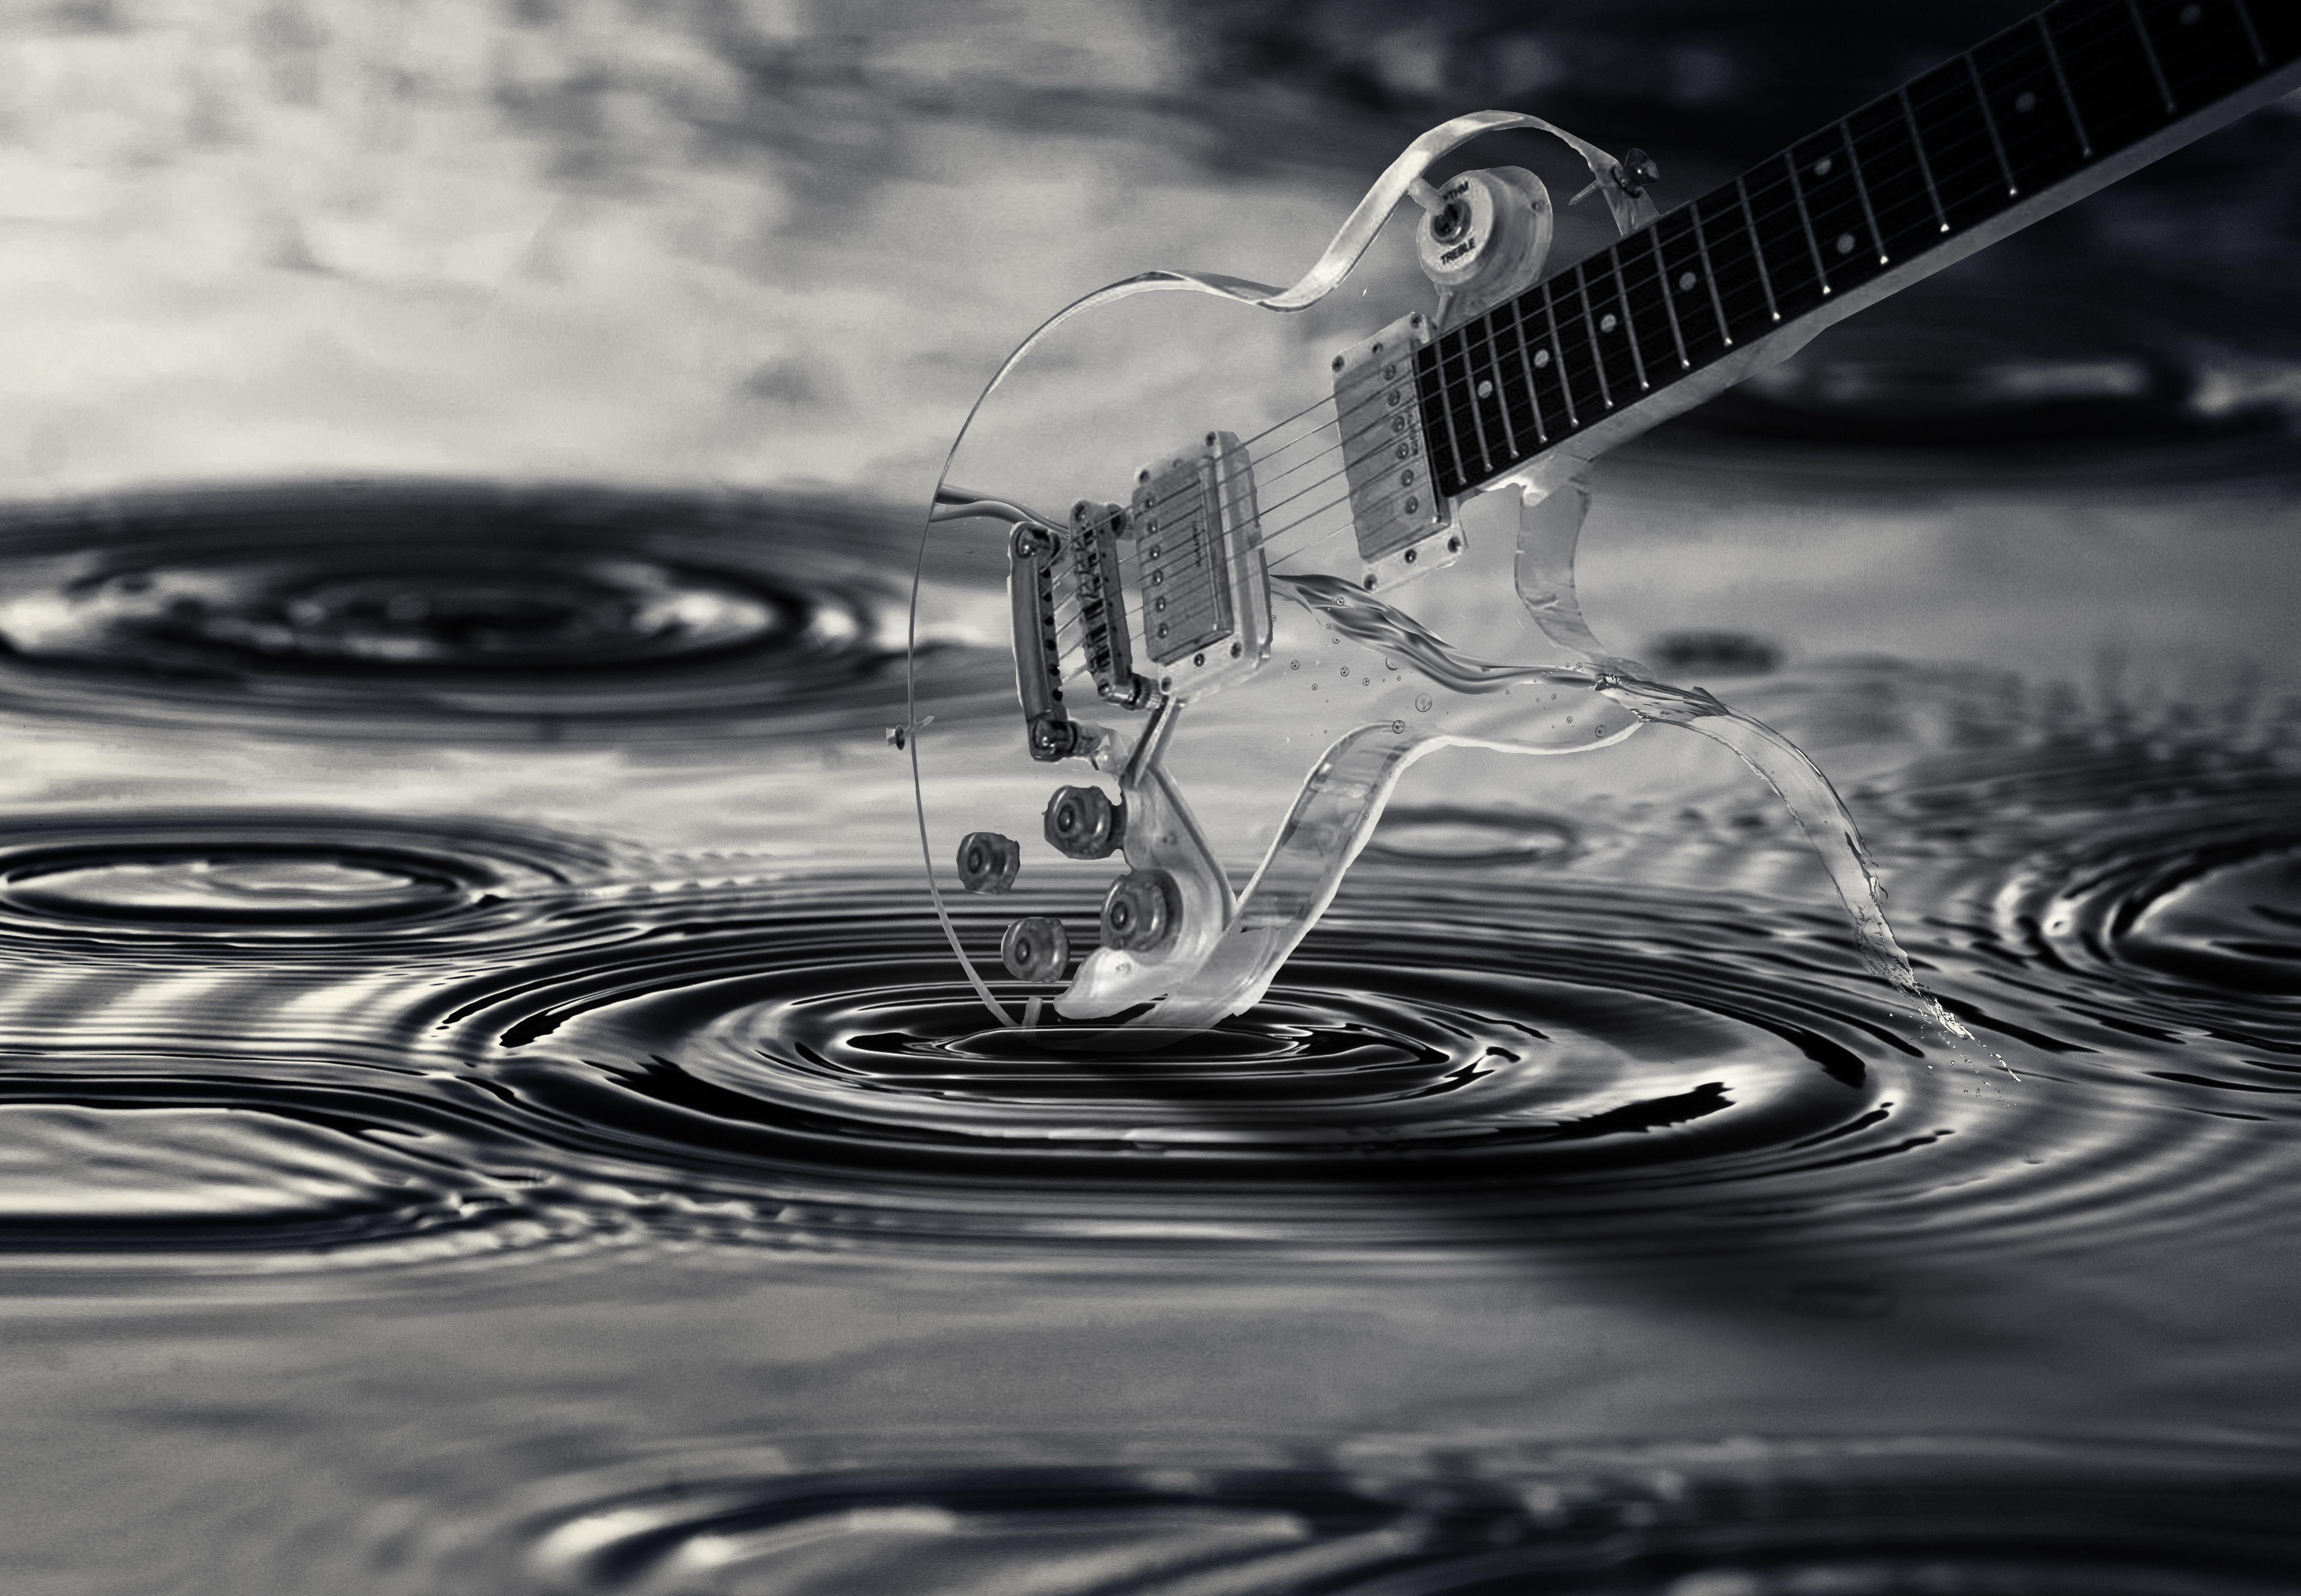 Guitar Computer Wallpapers Desktop Backgrounds 4982x3456 Id 602258 Wallpaper Backgrounds Music Wallpaper Background Images